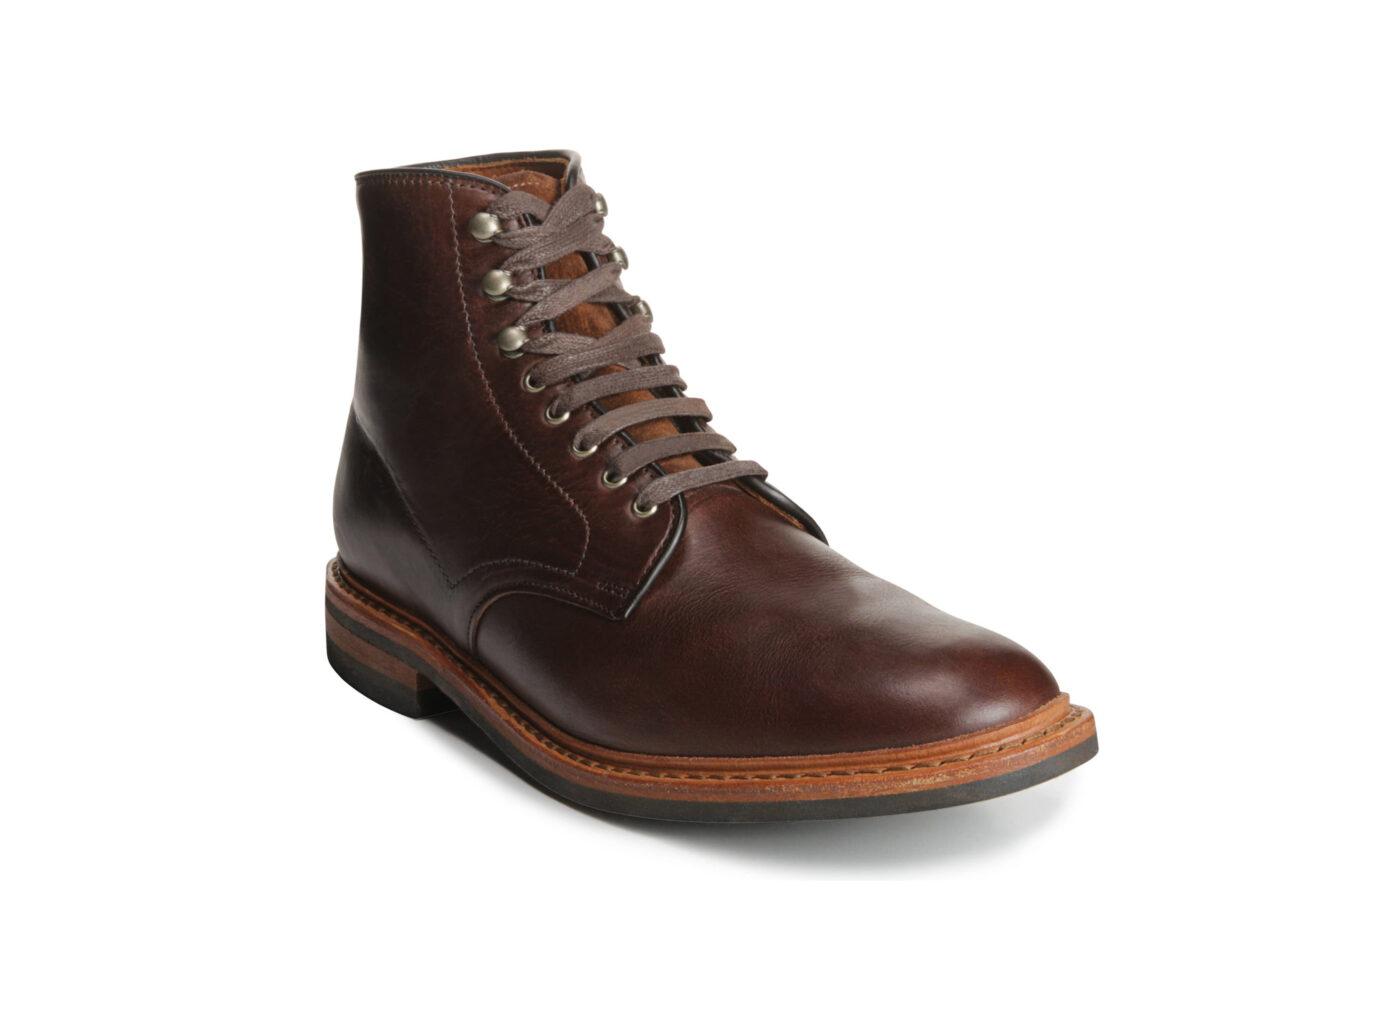 Allen Edmonds Higgins Mill Plain Toe Boot